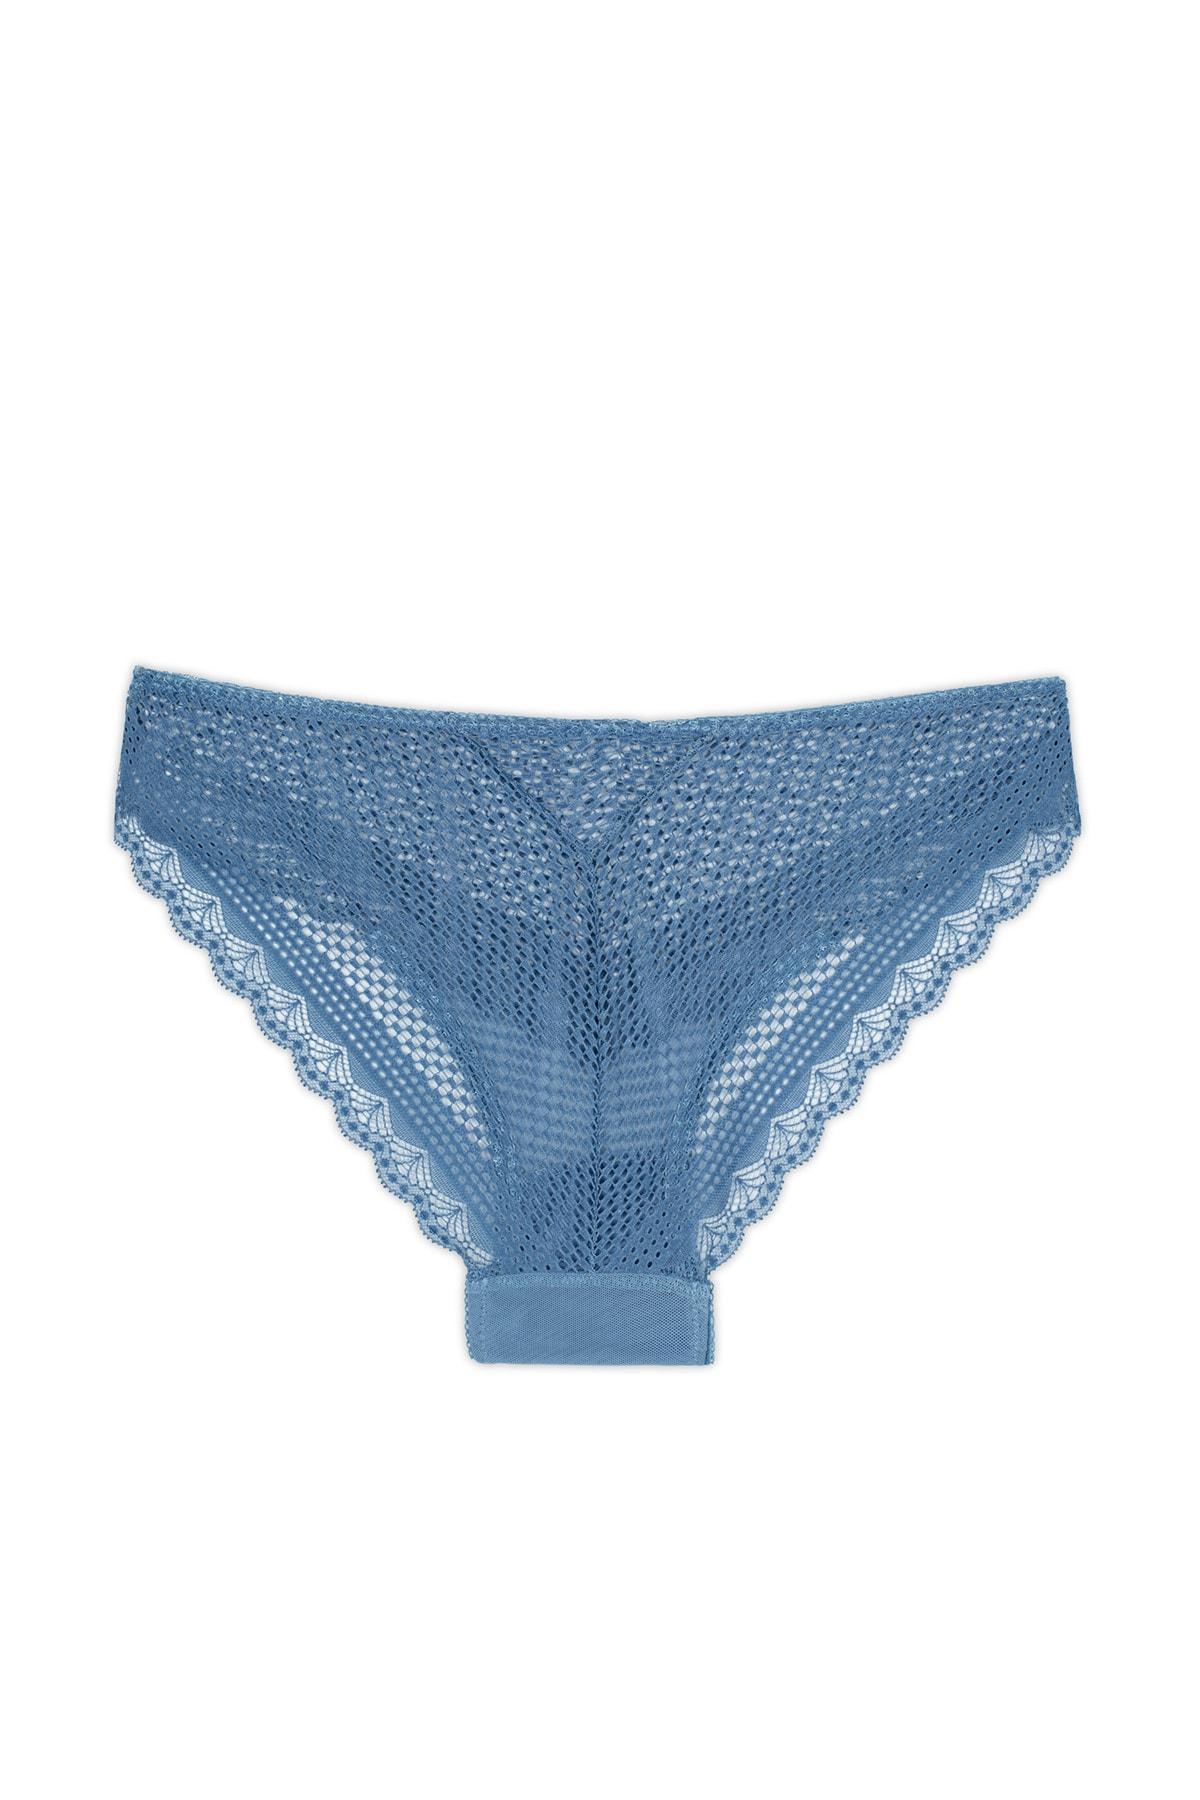 Lela Çelik Mavi Külot Kadın Külot 511M2017K